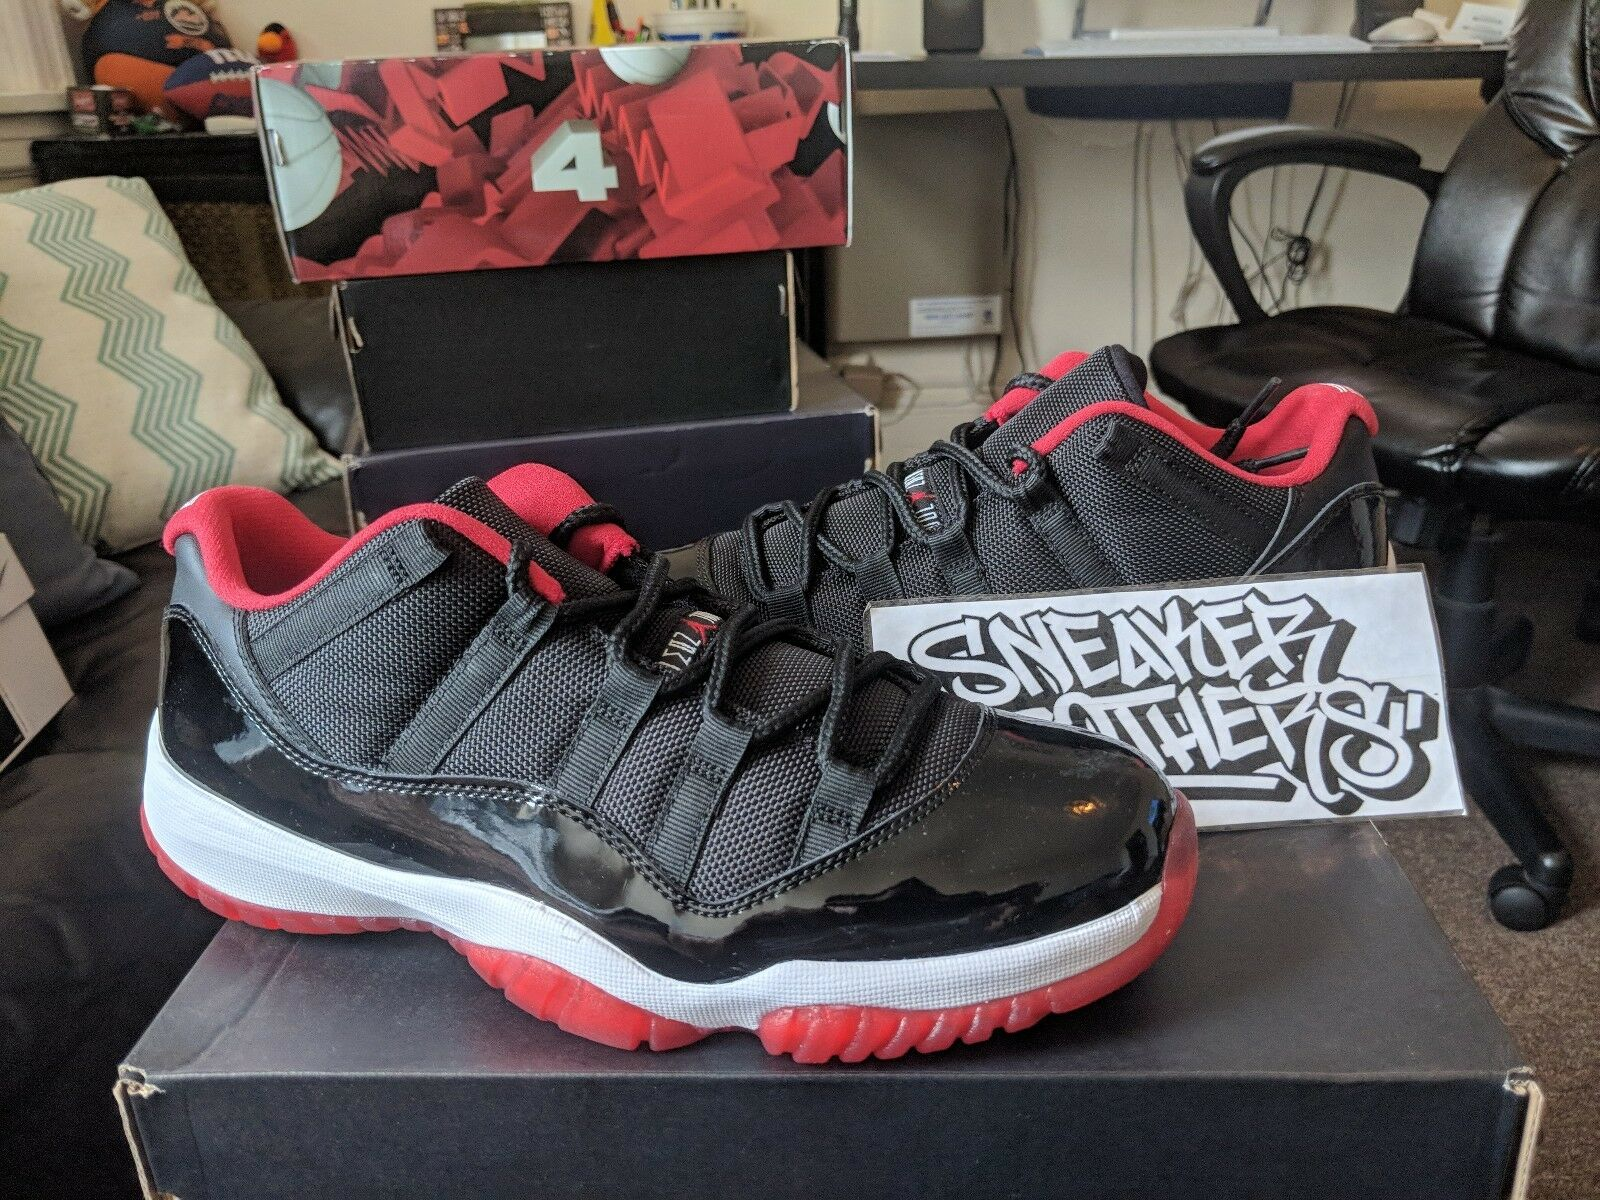 Nike Air Jordan Retro XI 11 Low Bred Black True Red White 528895-012